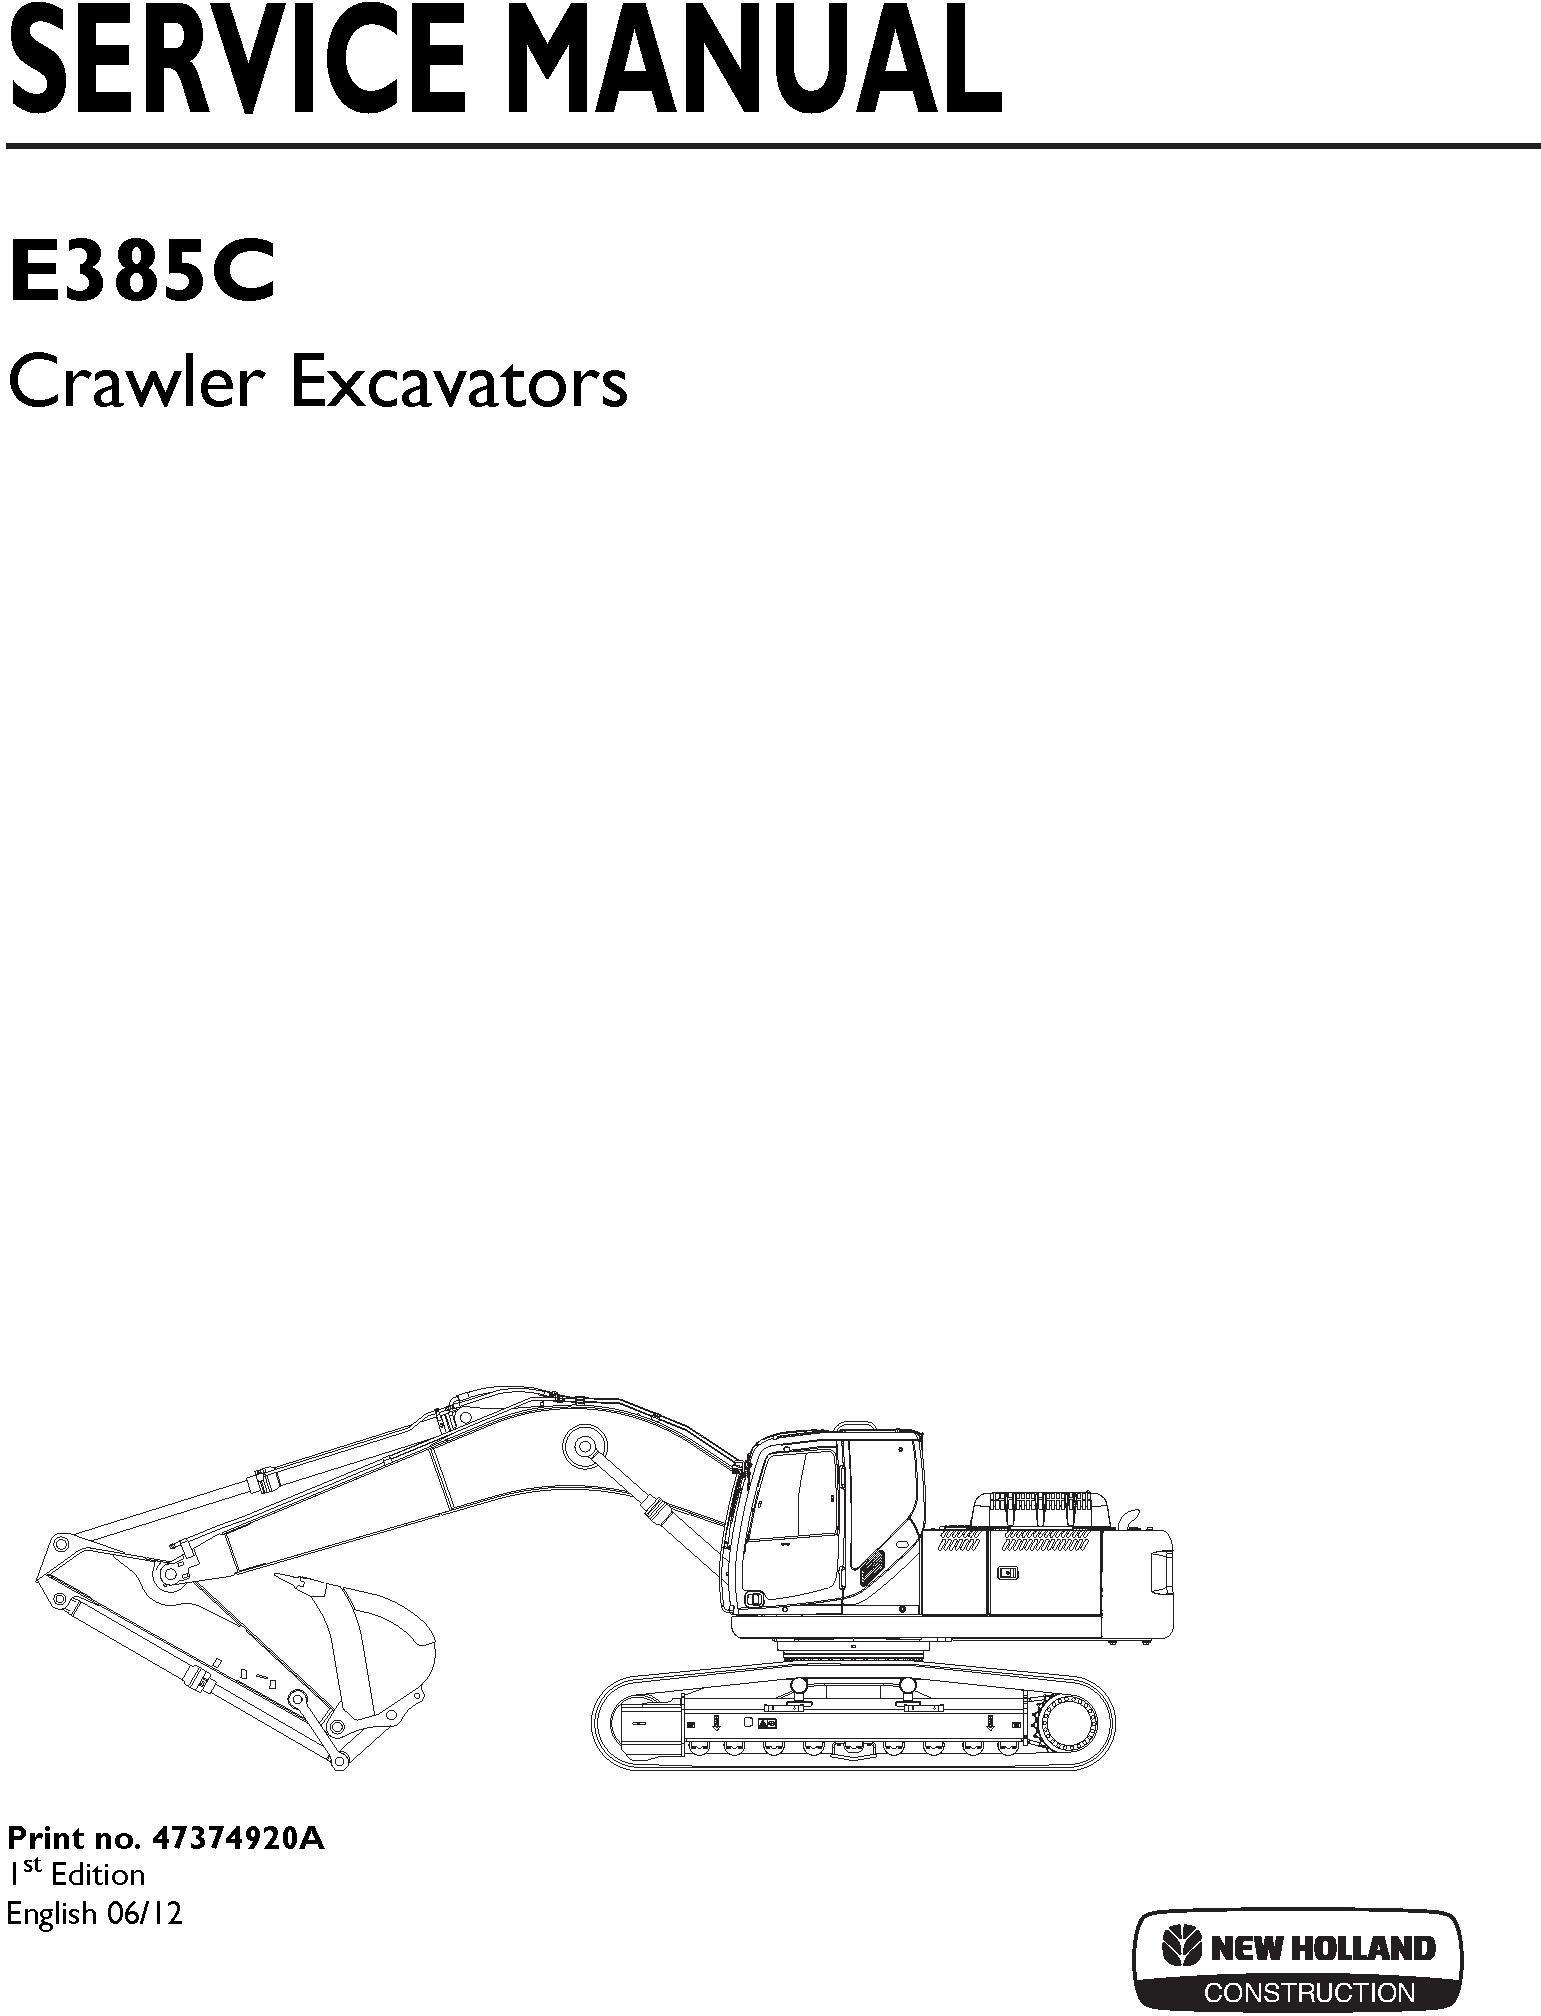 New Holland E385C Crawler Excavator Service Manual / Deere